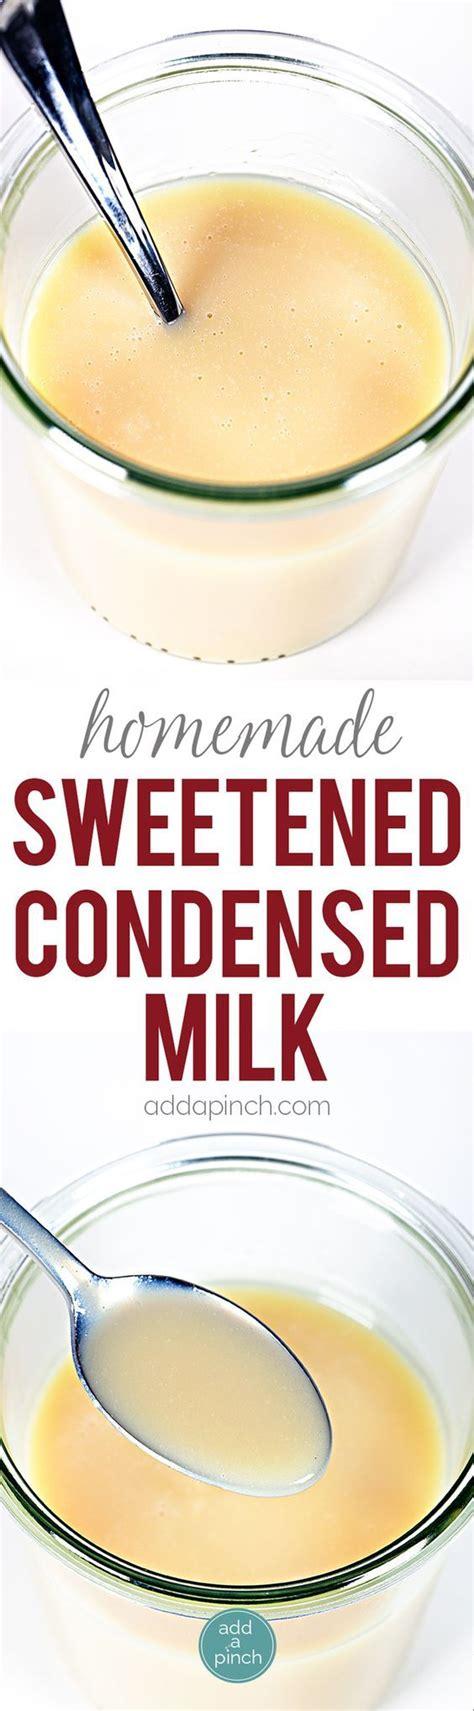 sweetened condensed milk recipes homemade sweetened condensed milk recipe homemade